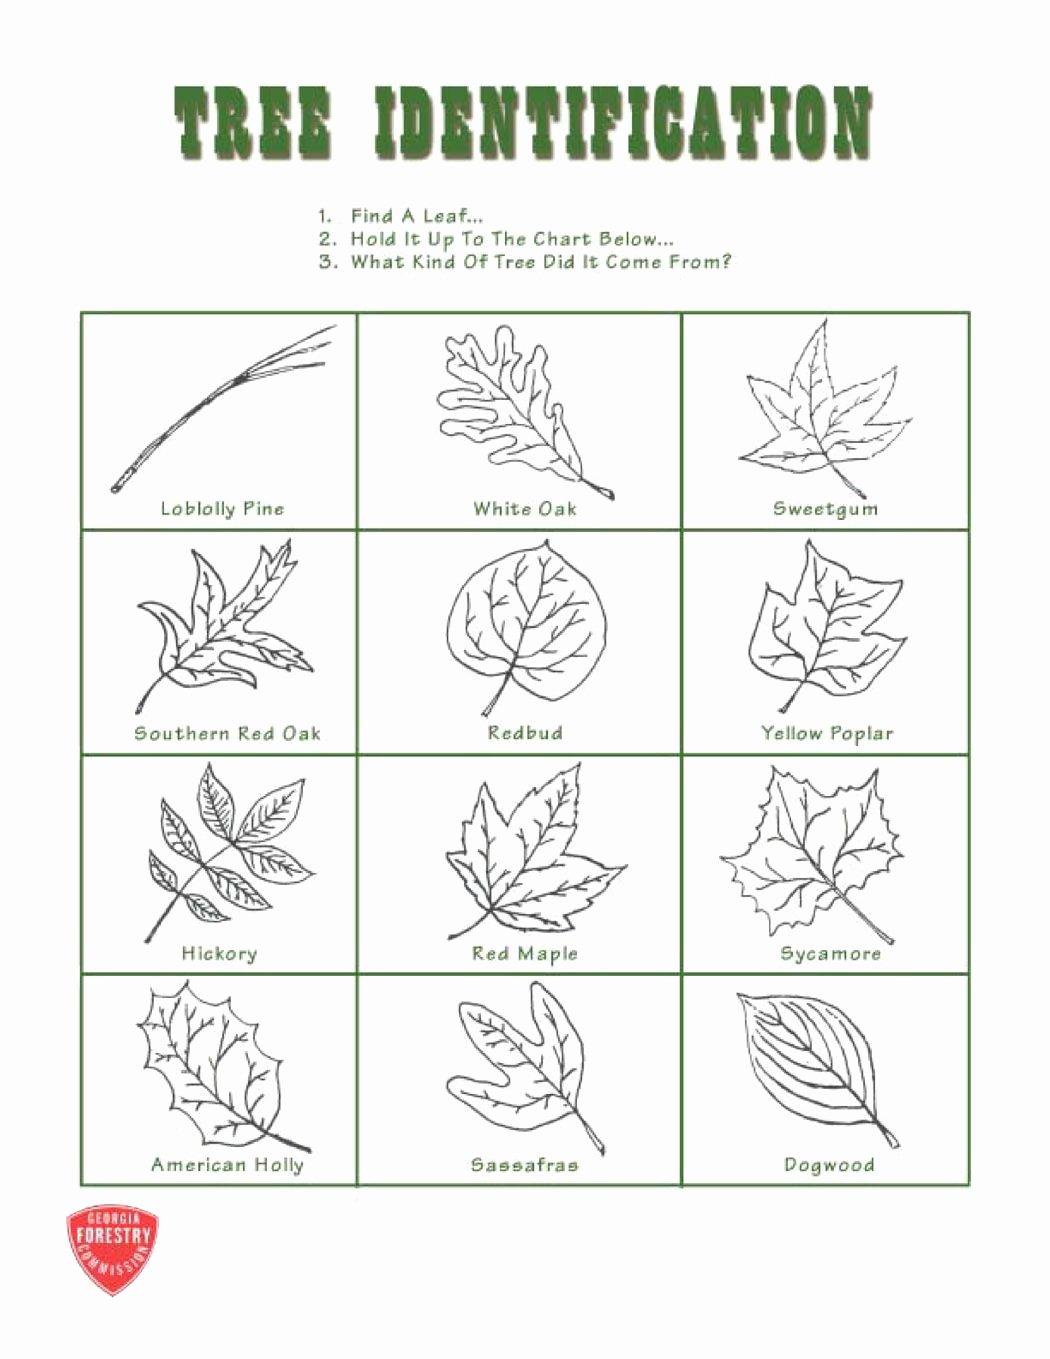 The Nature Of Science Worksheet Luxury Tree Identification On Pinterest